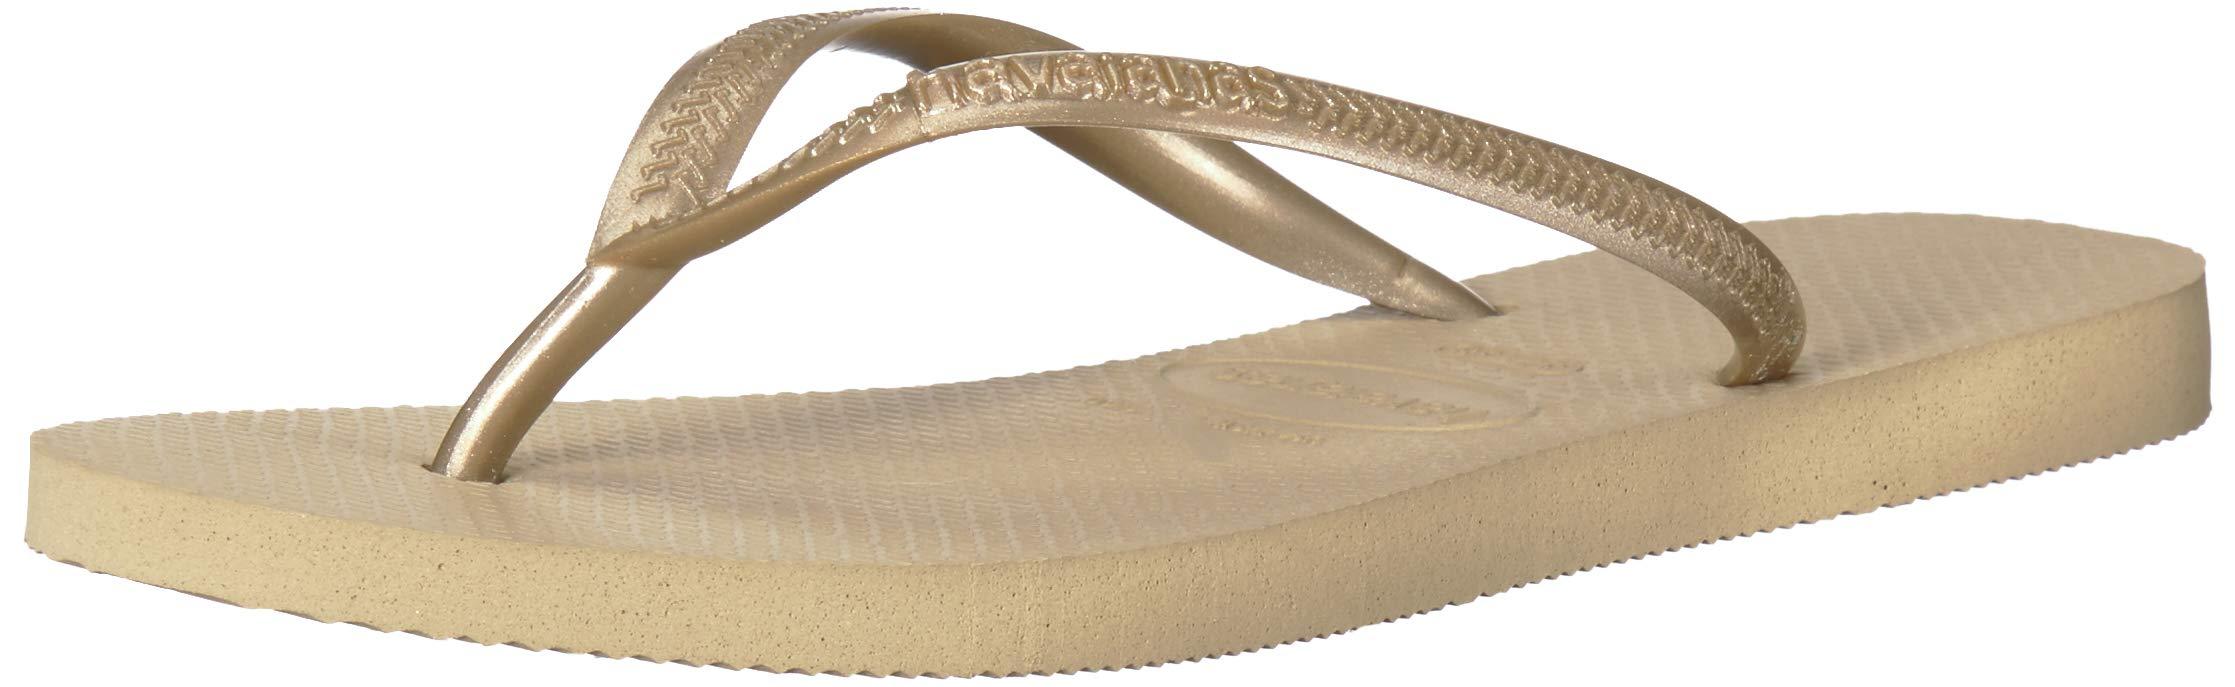 Havaianas Women's Slim Sandal,Sand Grey/ Light Gold,37/38 BR (7-8 M US)